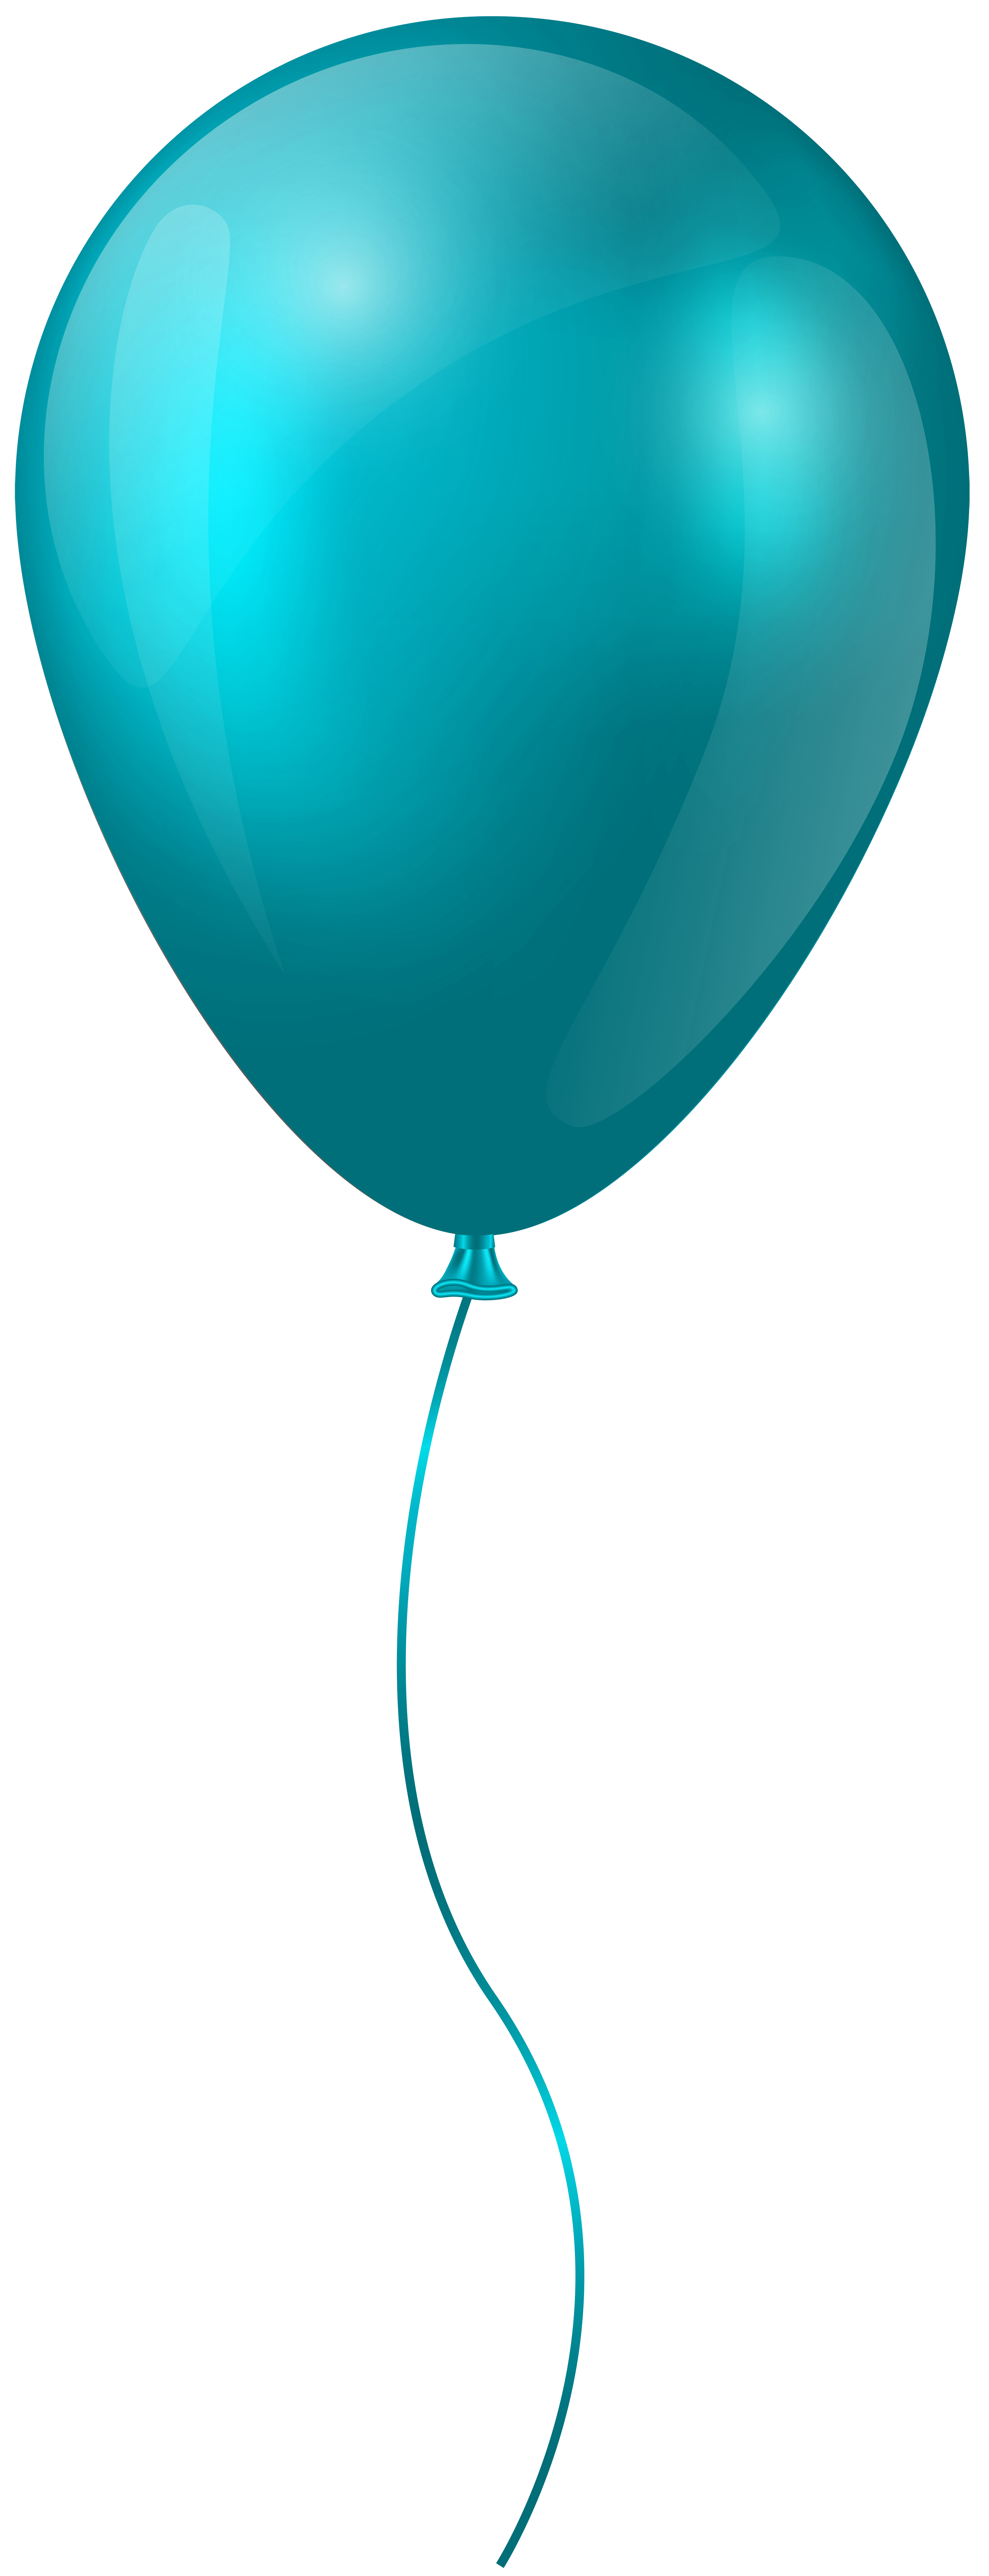 Blue transparent clip art. Clipart balloon teal